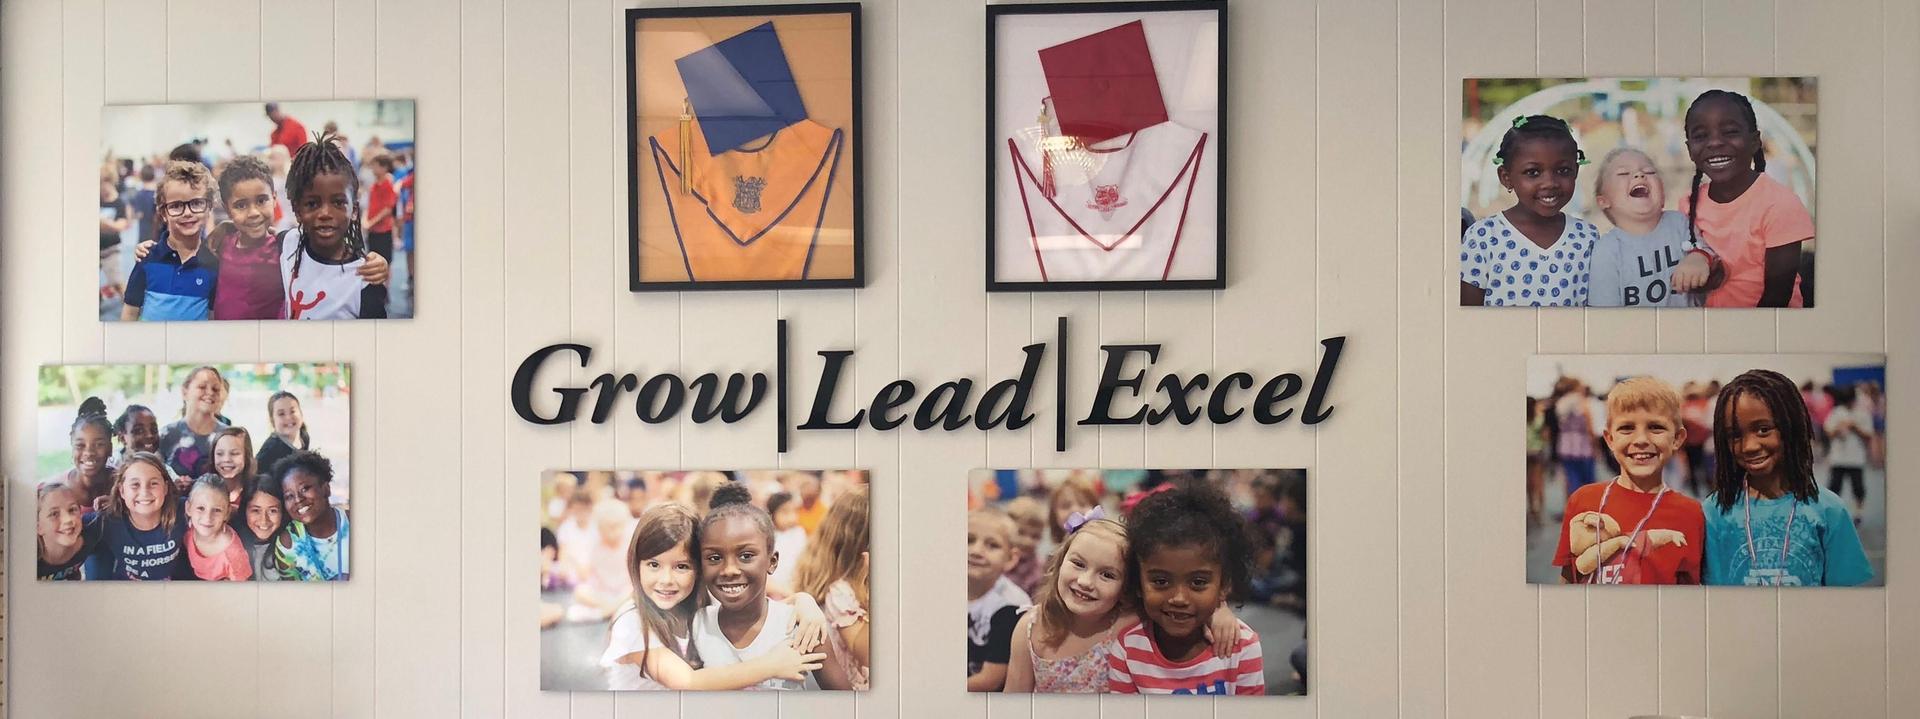 Grow.Lead.Excel. Diagram